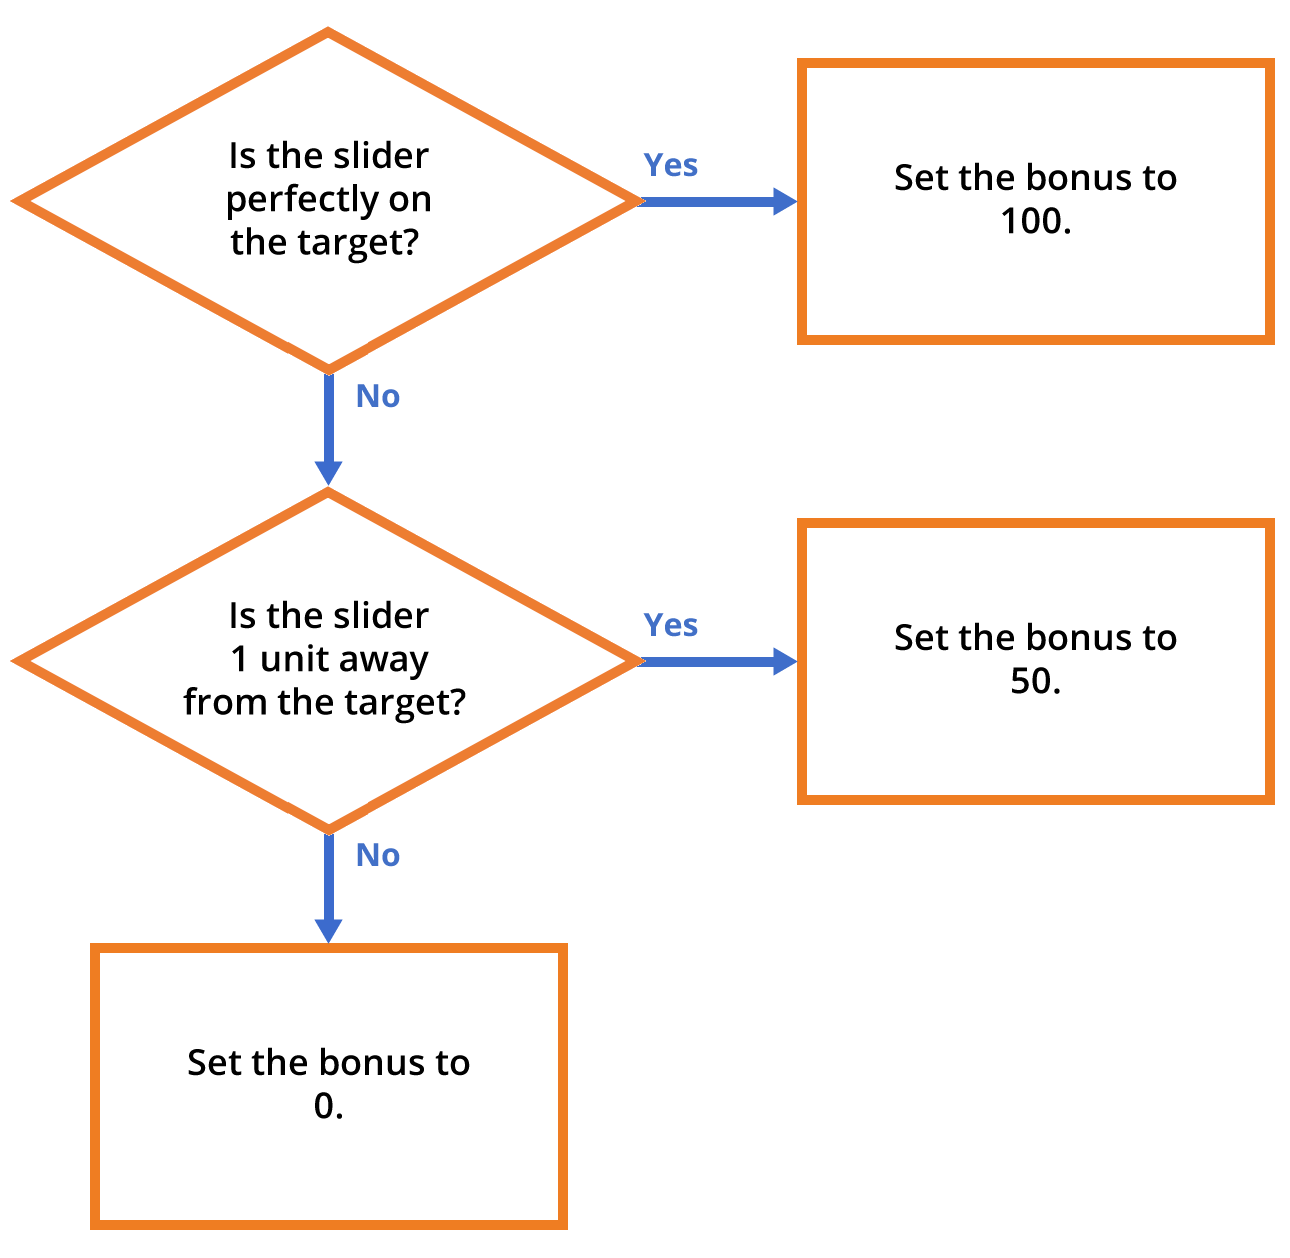 Flowchart illustrating how the bonus is determined